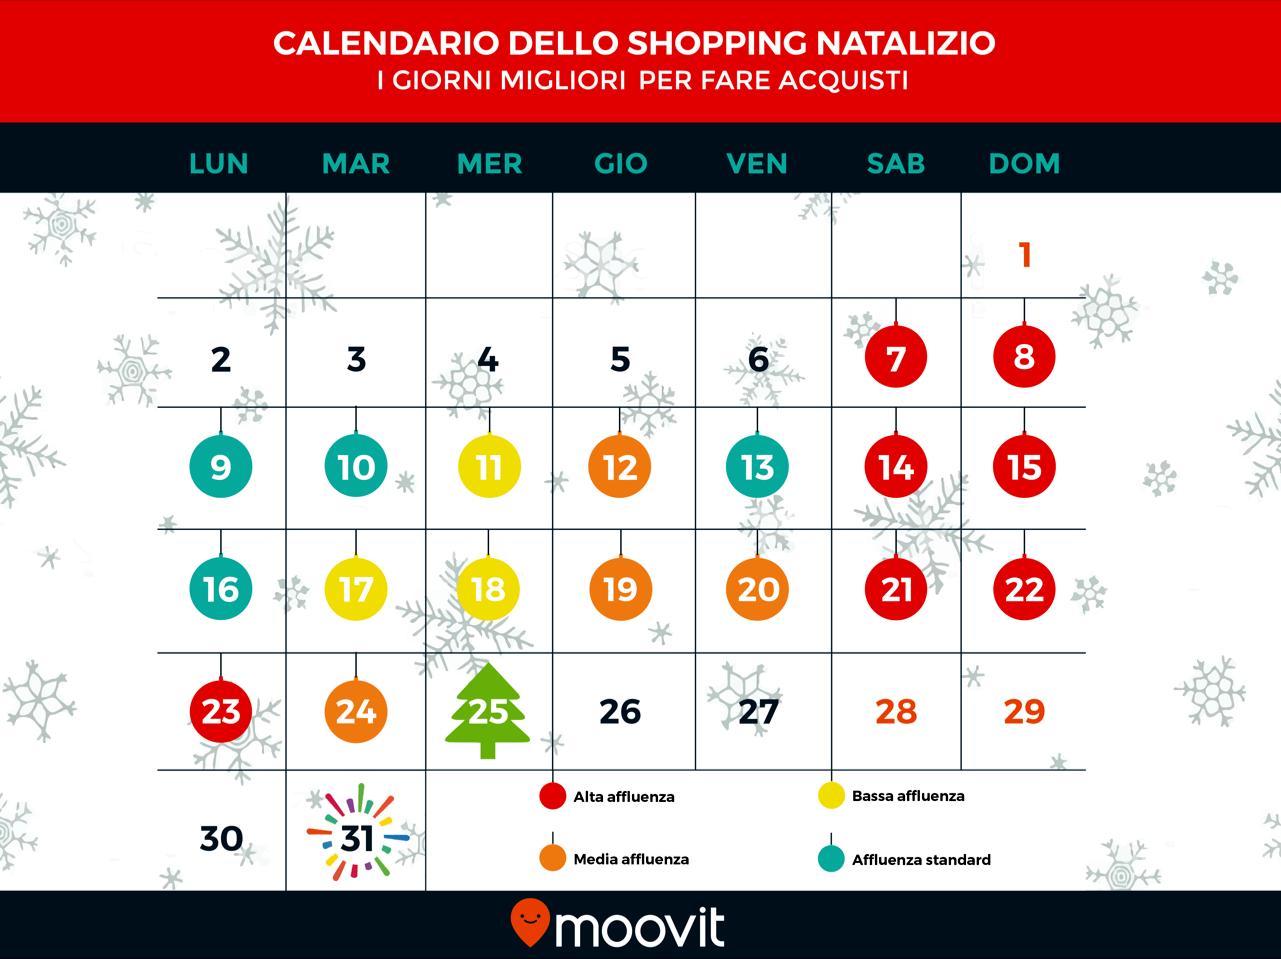 Calendario shopping natalizio elaborato da Moovit-2